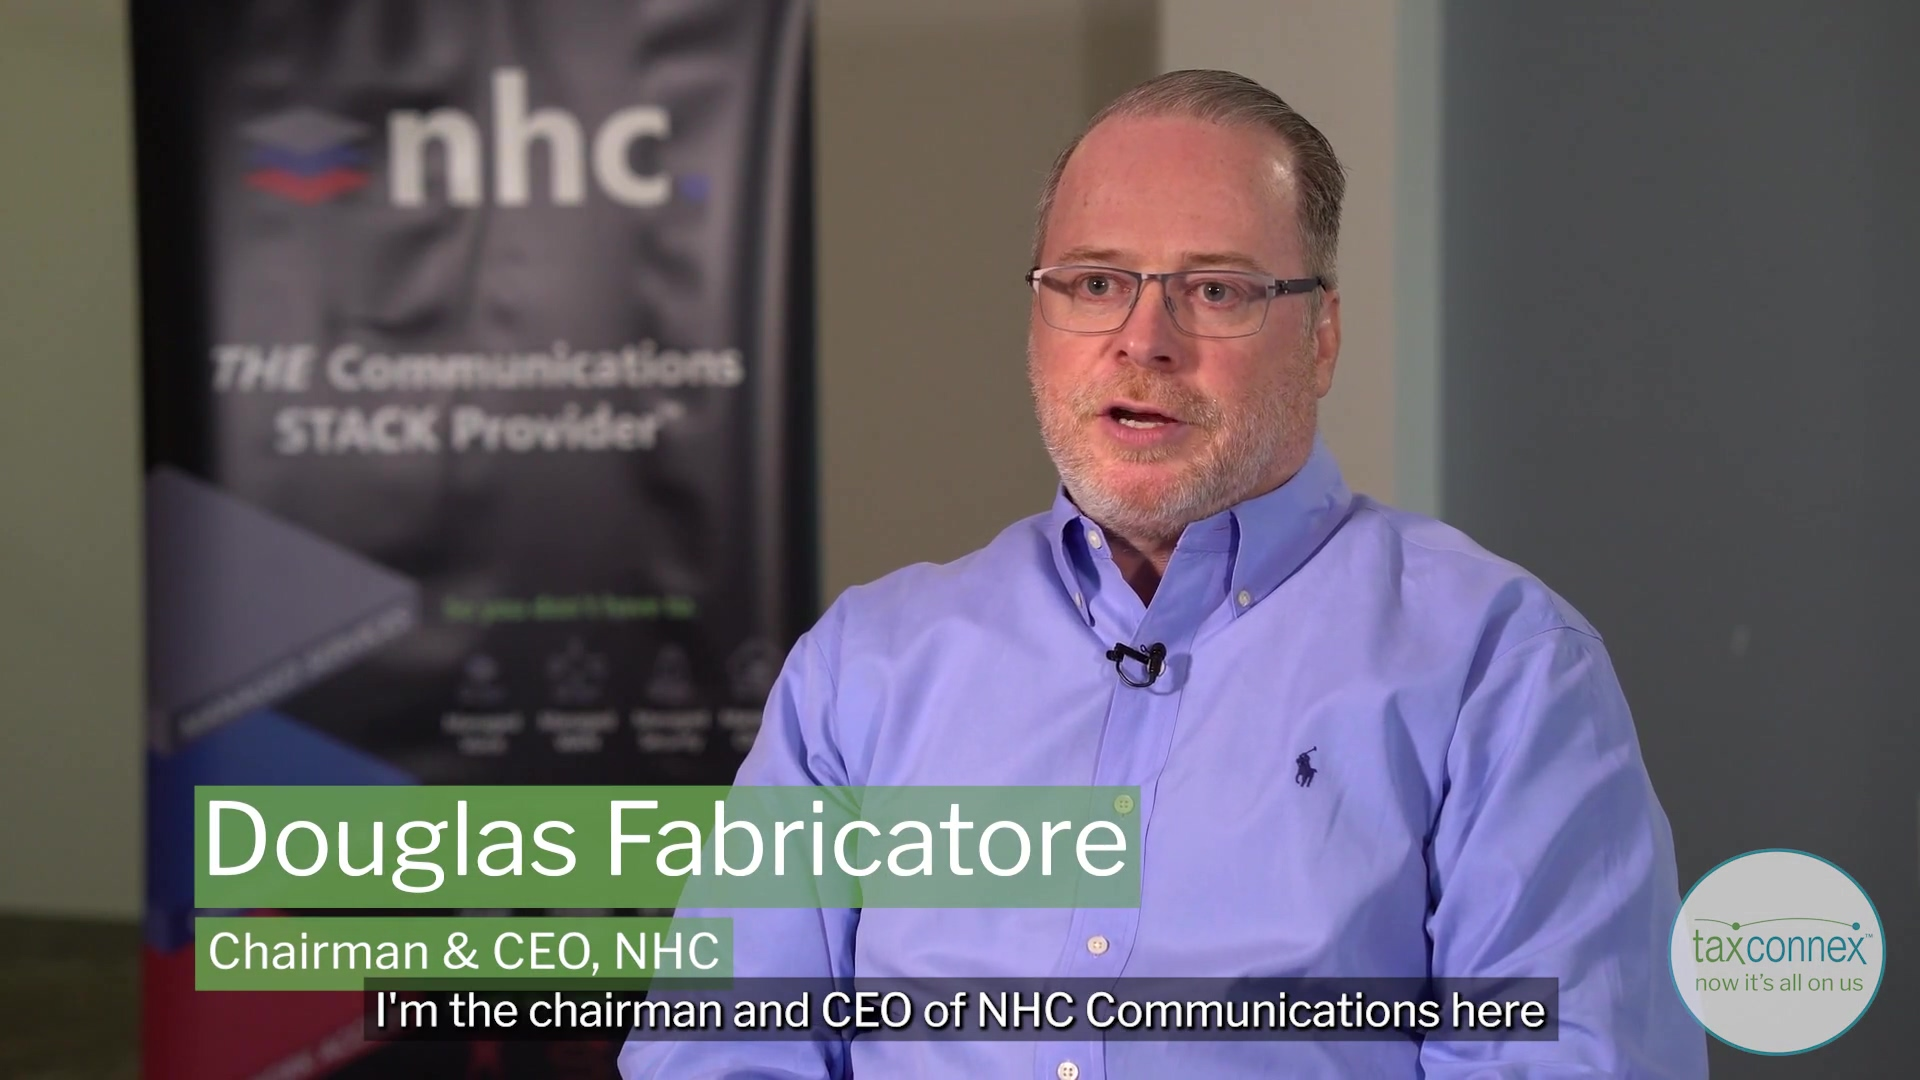 NHC Client Testimonial Video v2.2